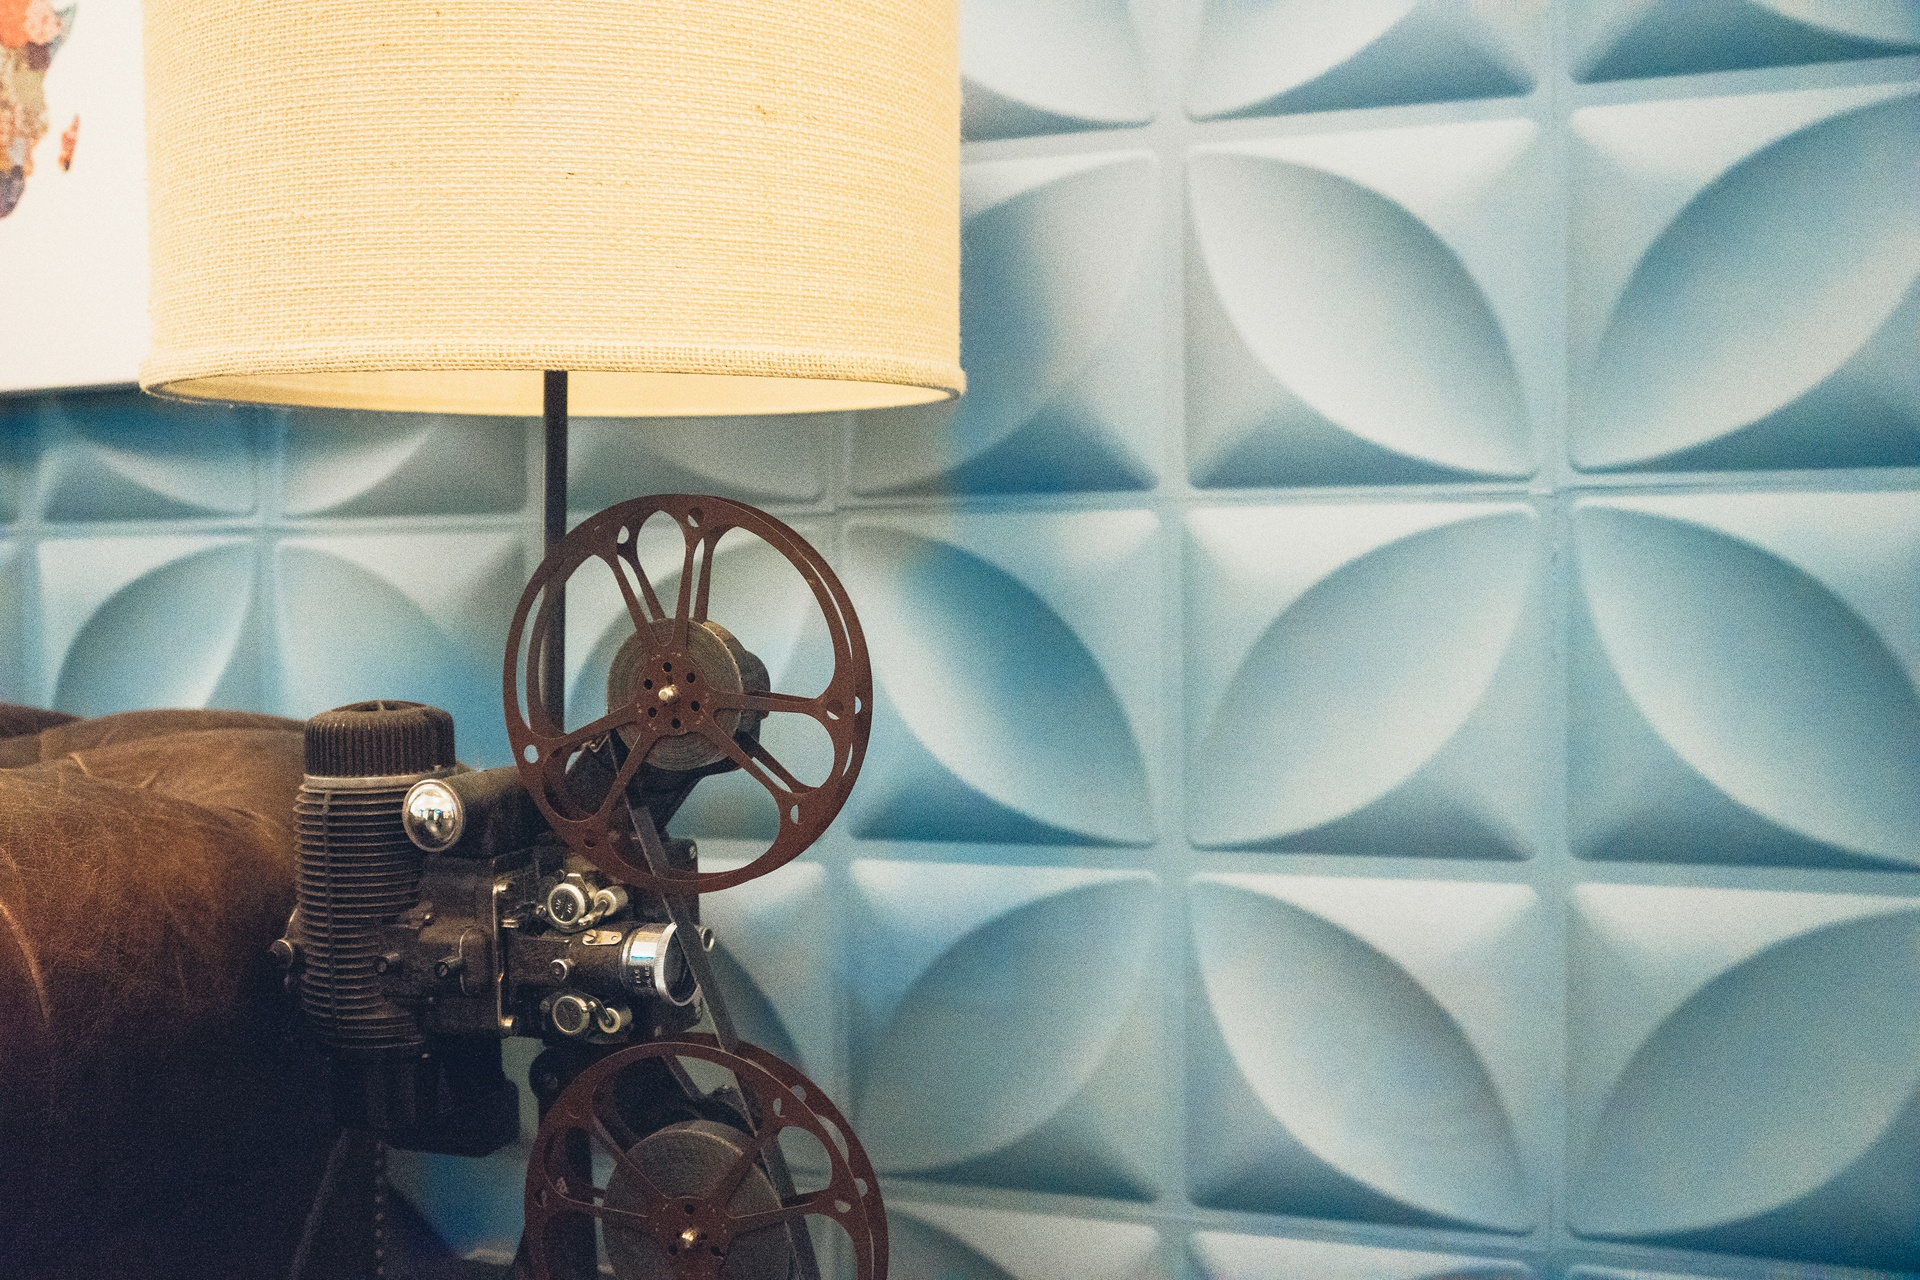 35mm film projector